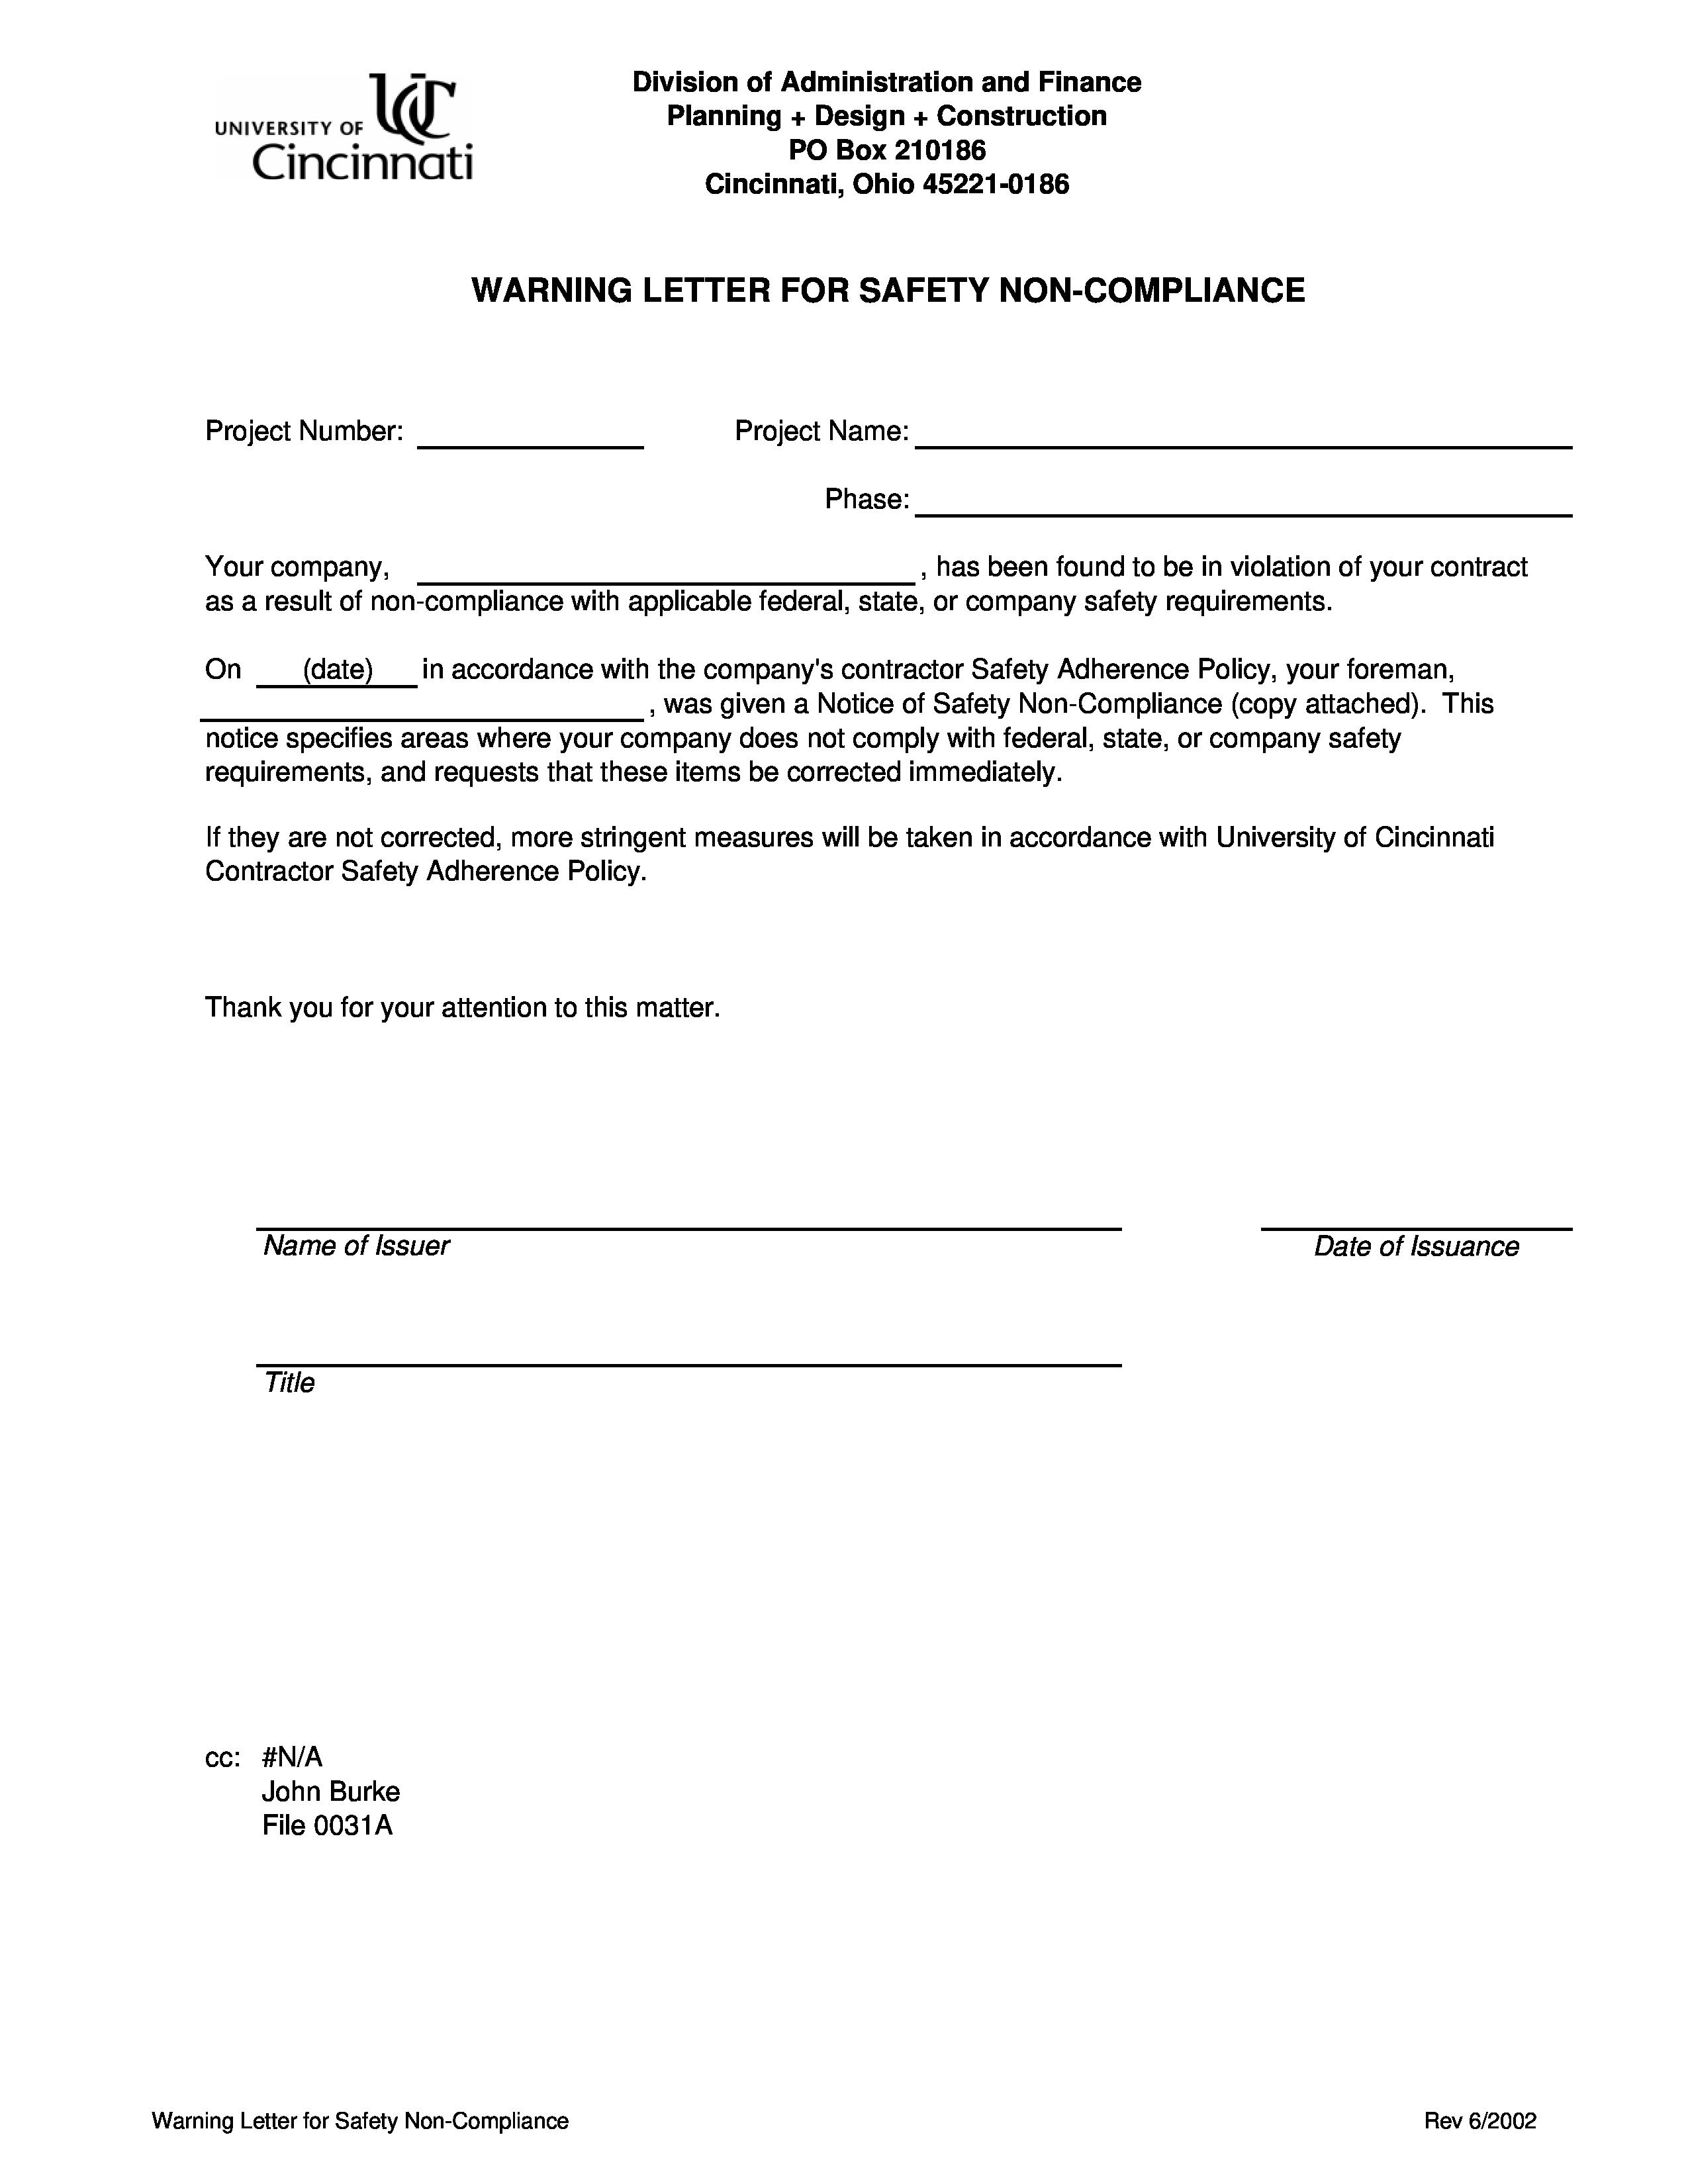 violation letter template - Yeder berglauf-verband com